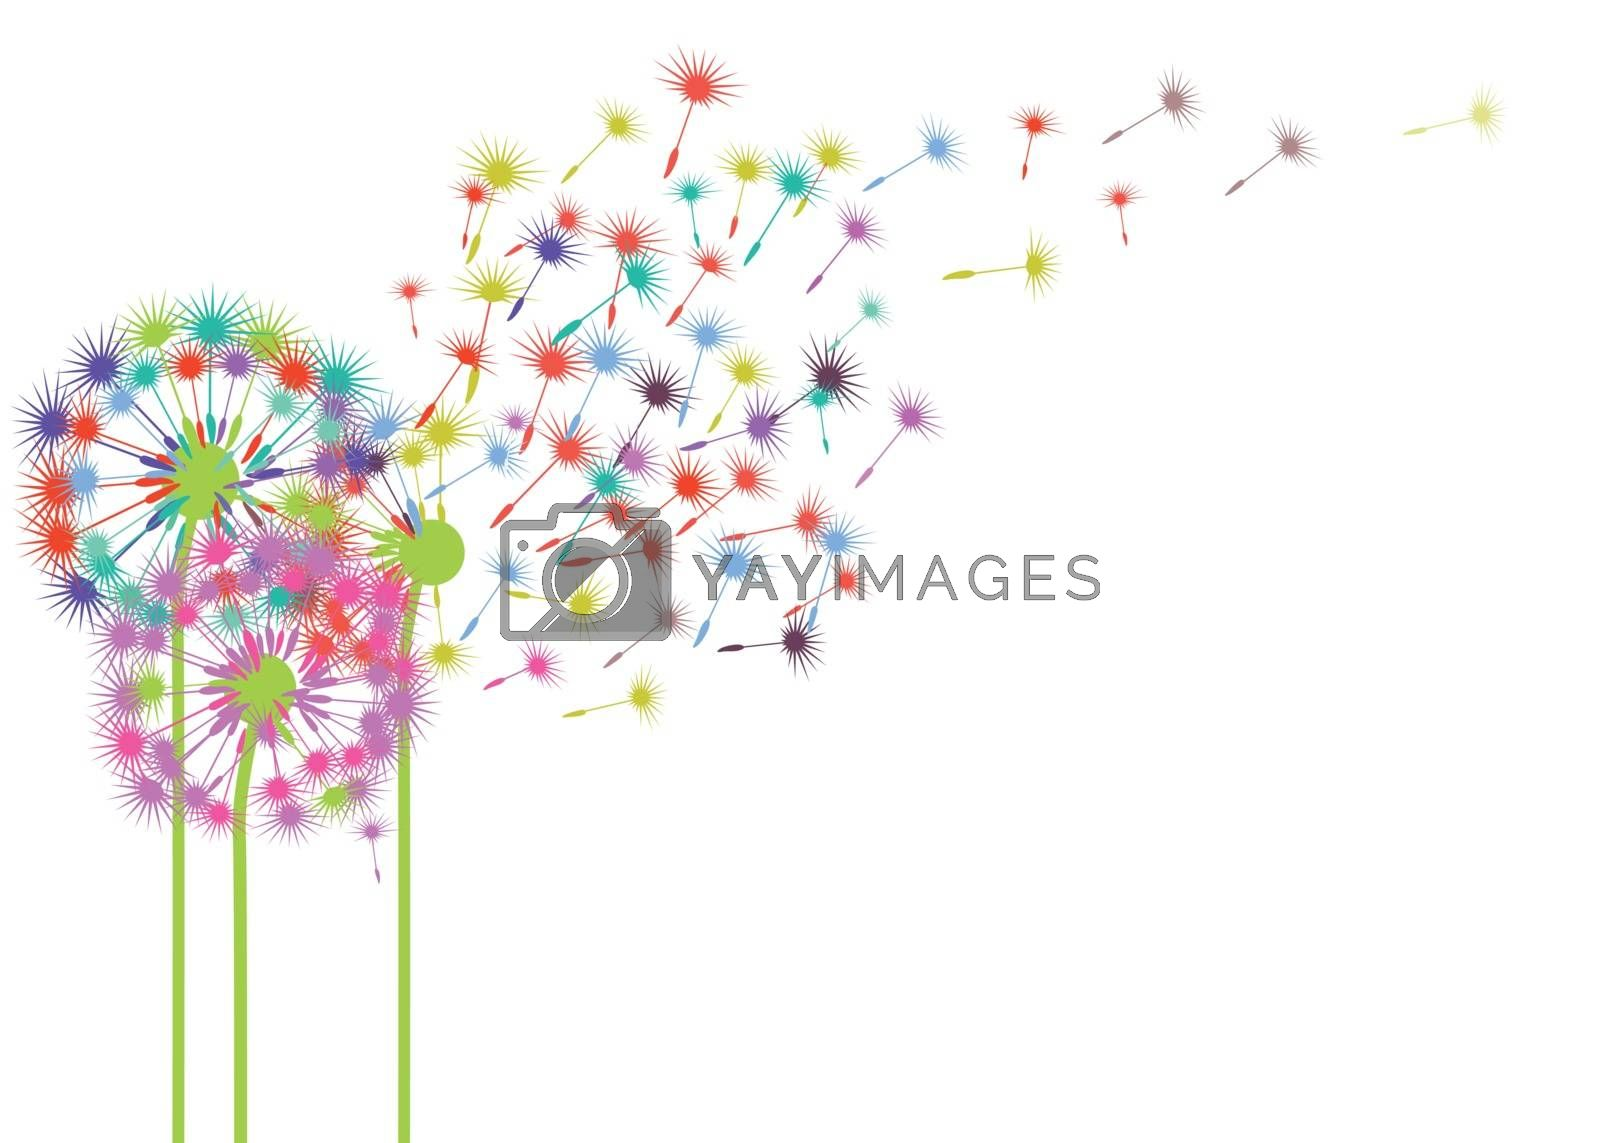 Dandelions in the wind illustration